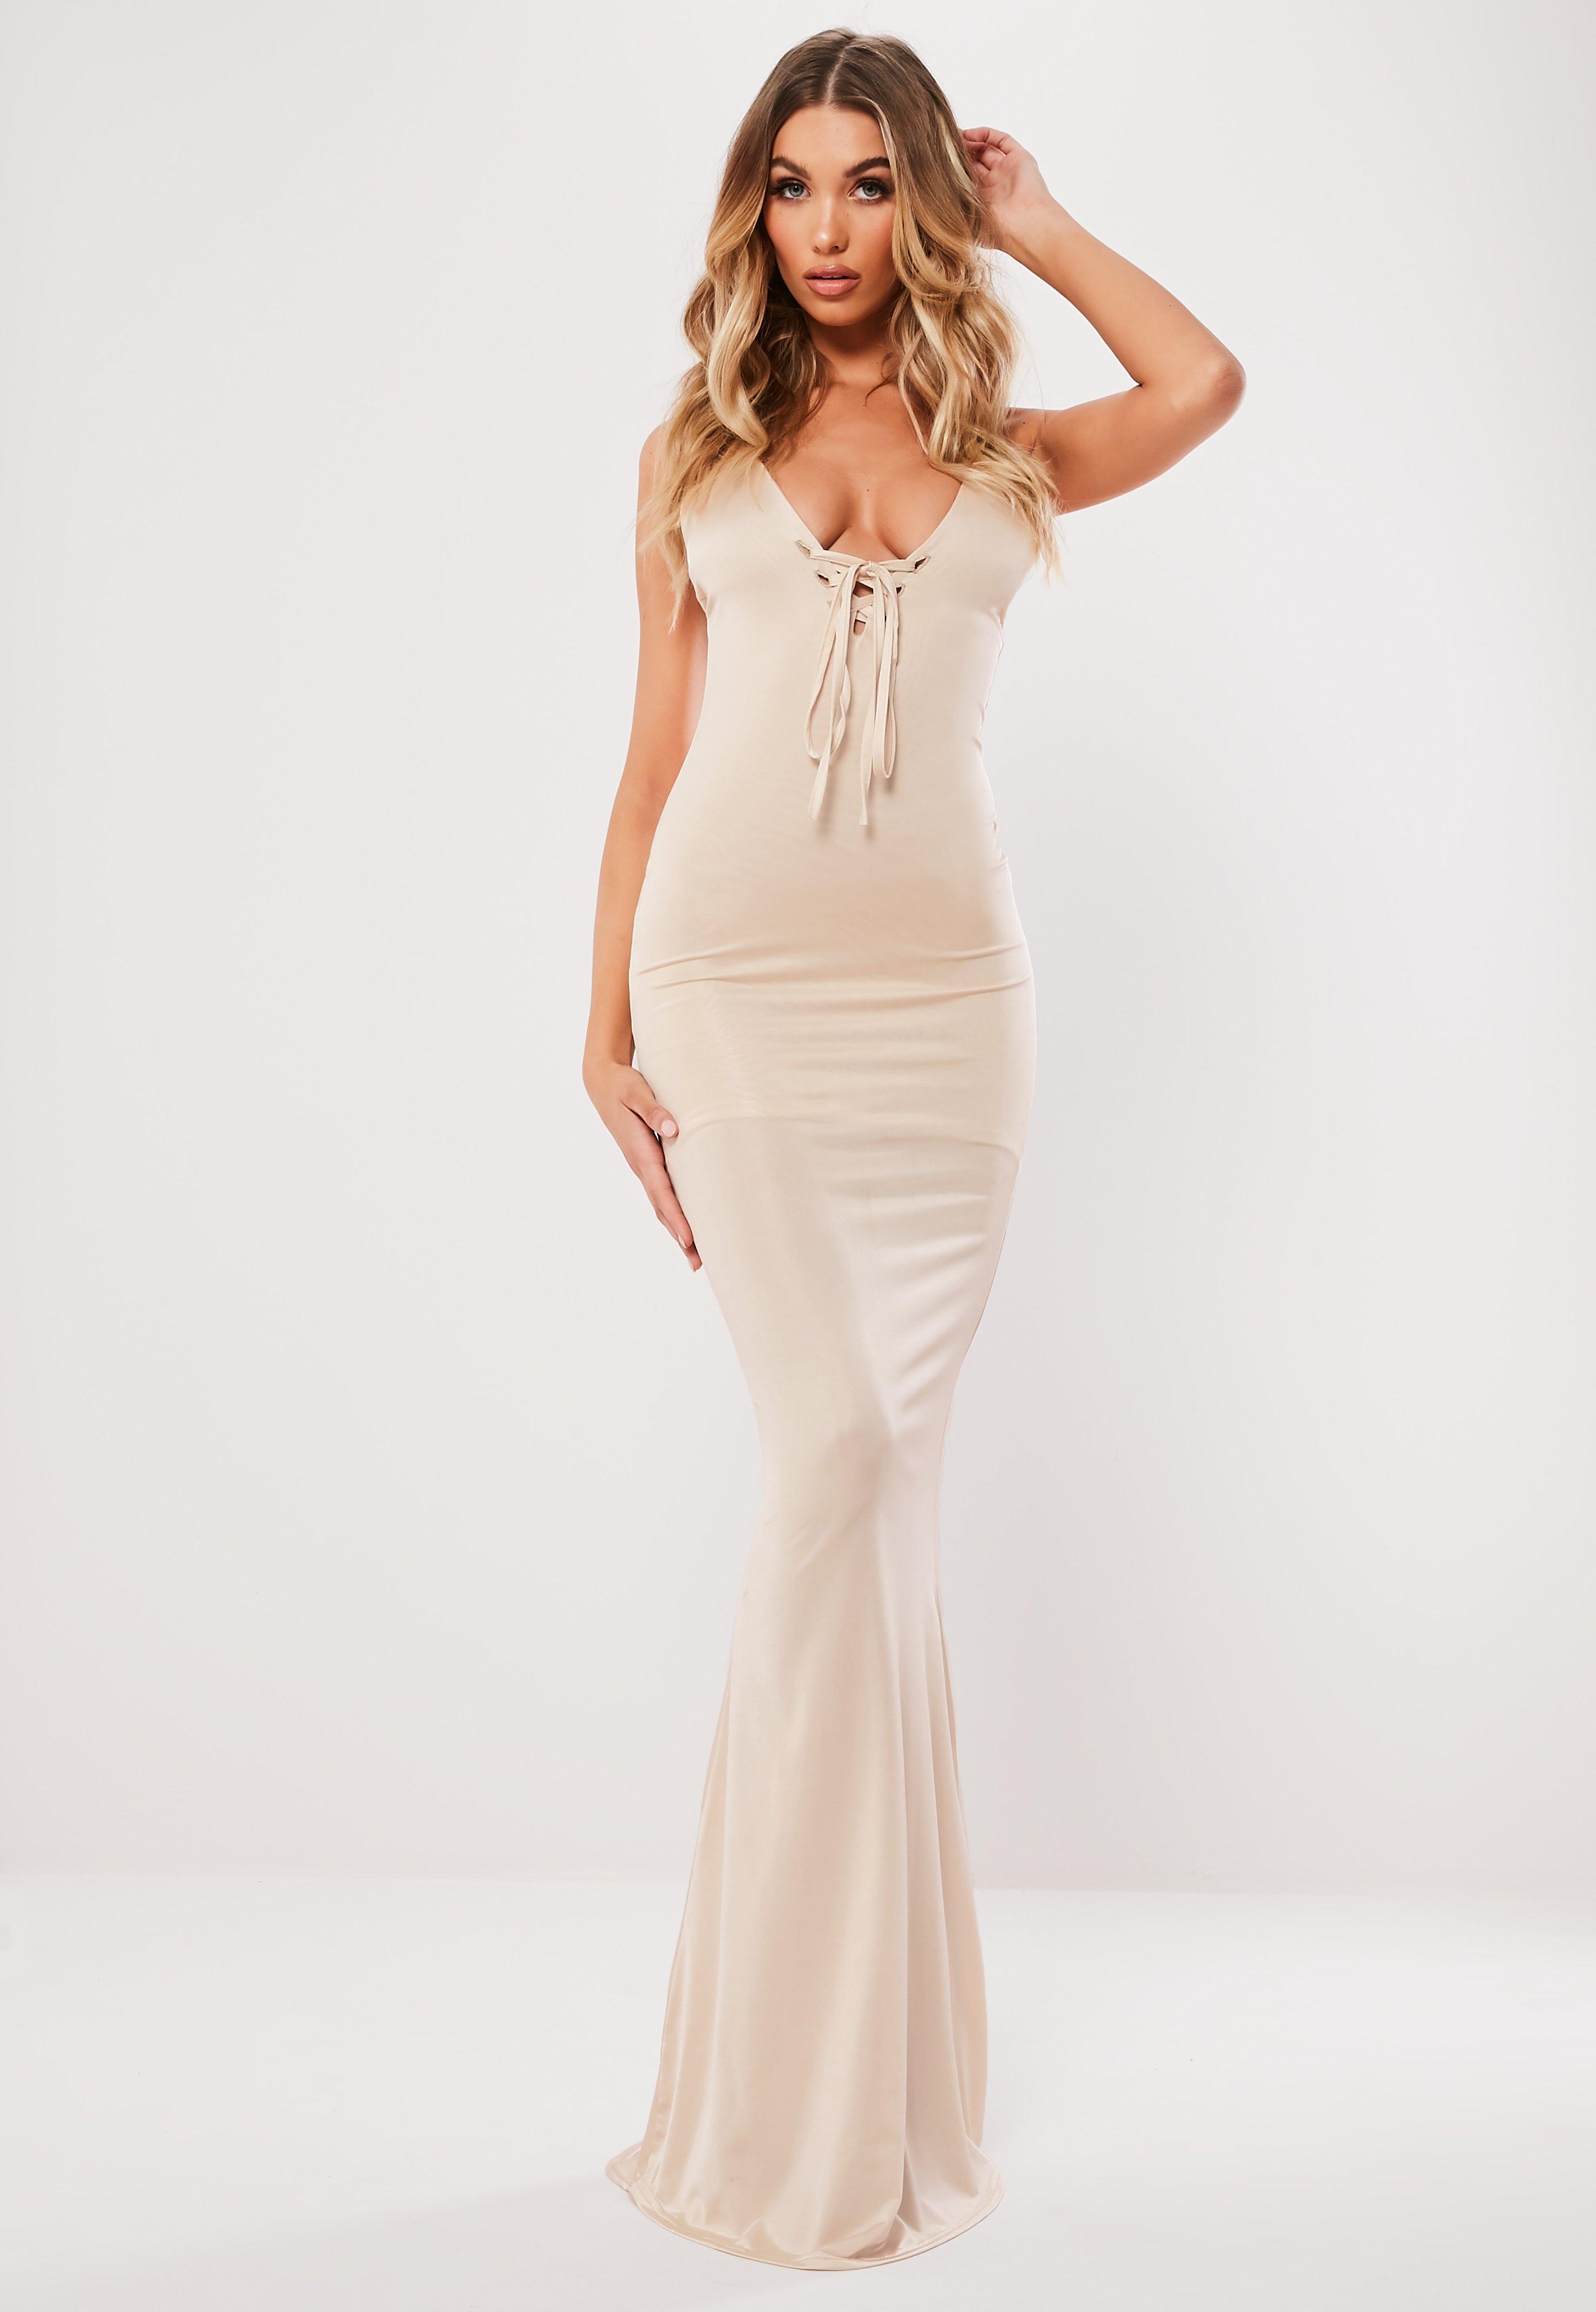 cae678681 Evening Dresses